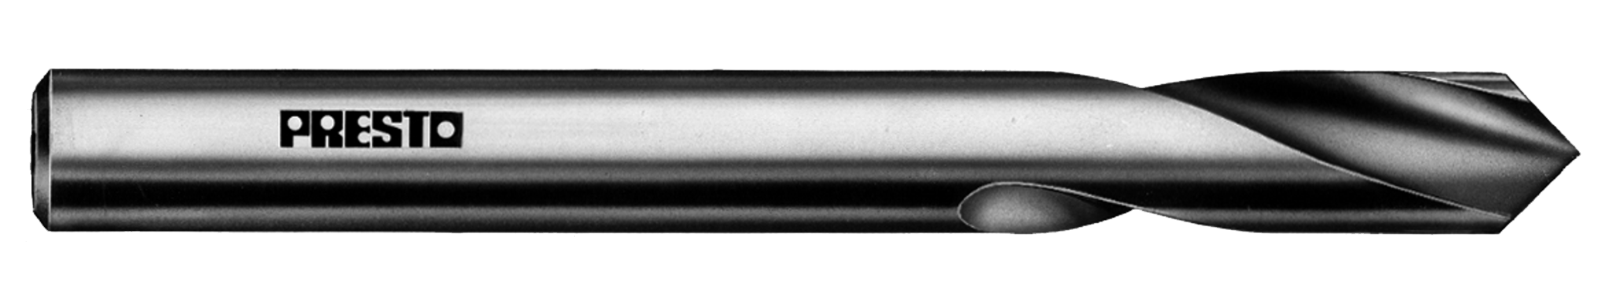 €MU‐Tools® HSSECo5 Hi‐Tech NC‐Anbohrer 90°, 3,0 - 25,0 mm zur AUSWAHL